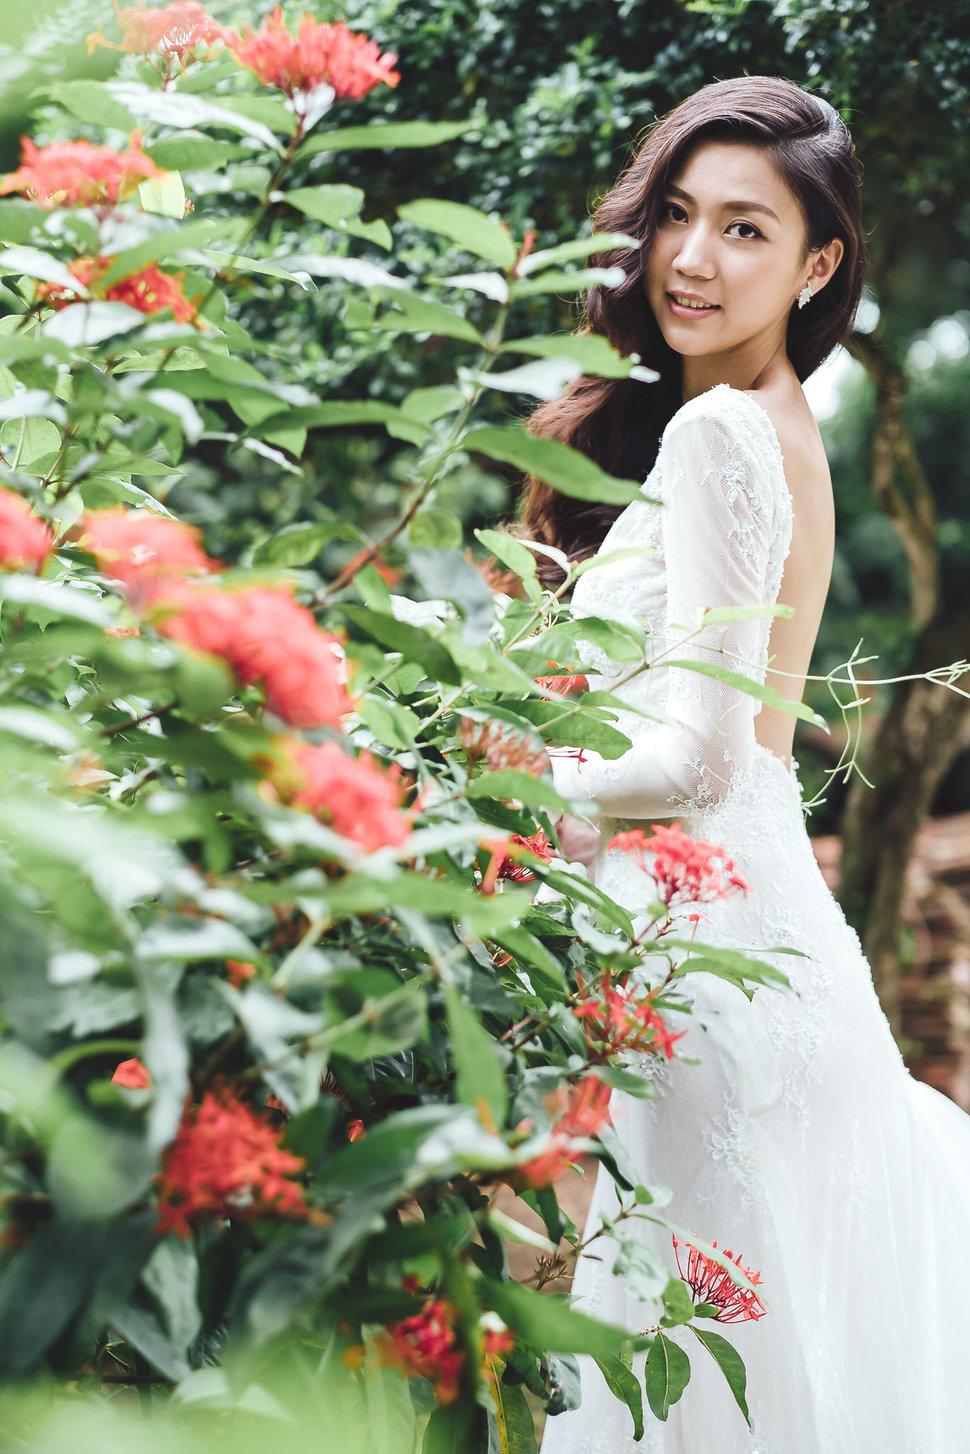 DSCF5455 - Vicky Li 新娘秘書《結婚吧》